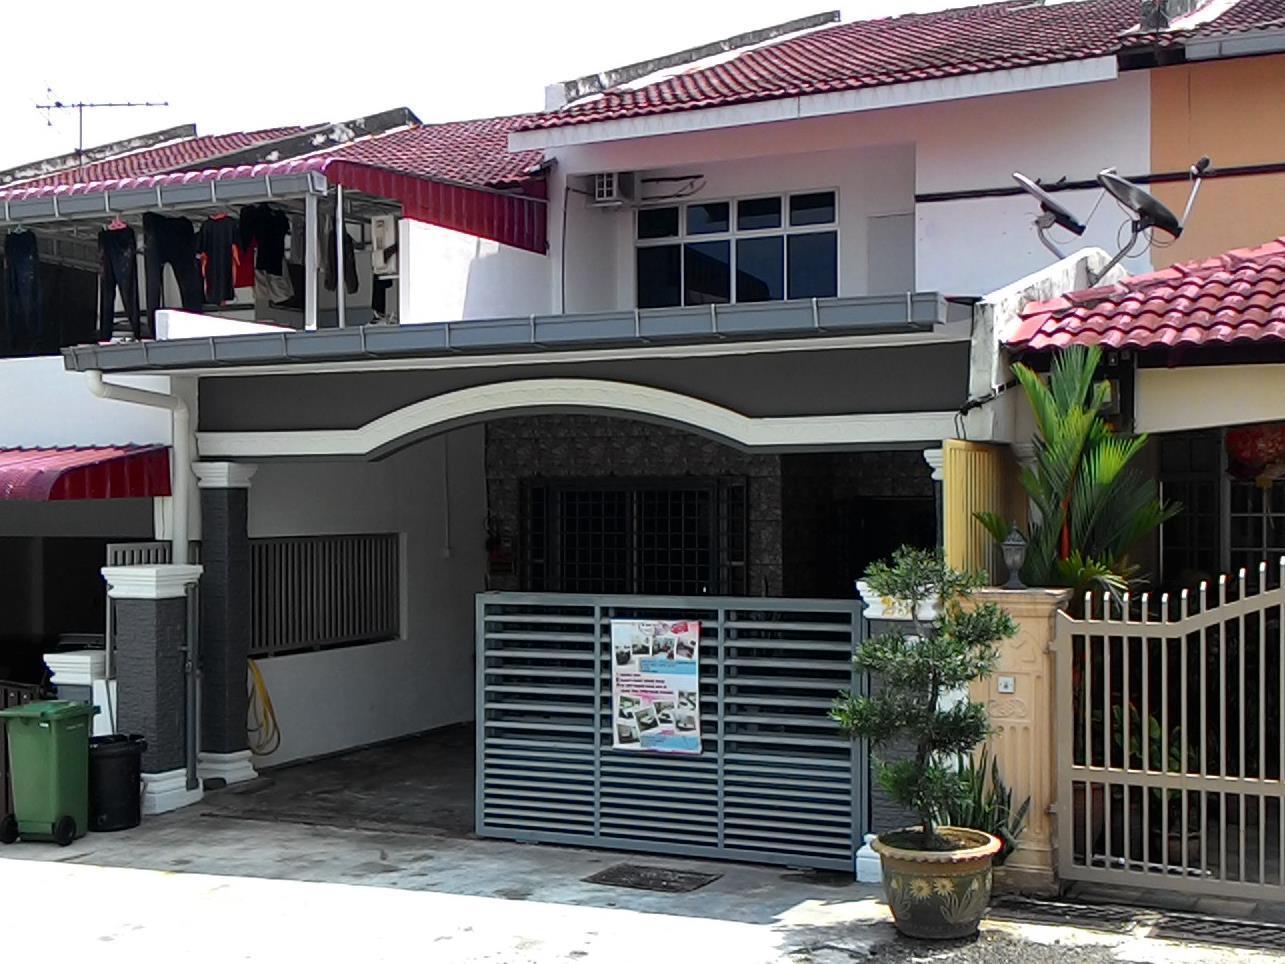 Daniels Guest House